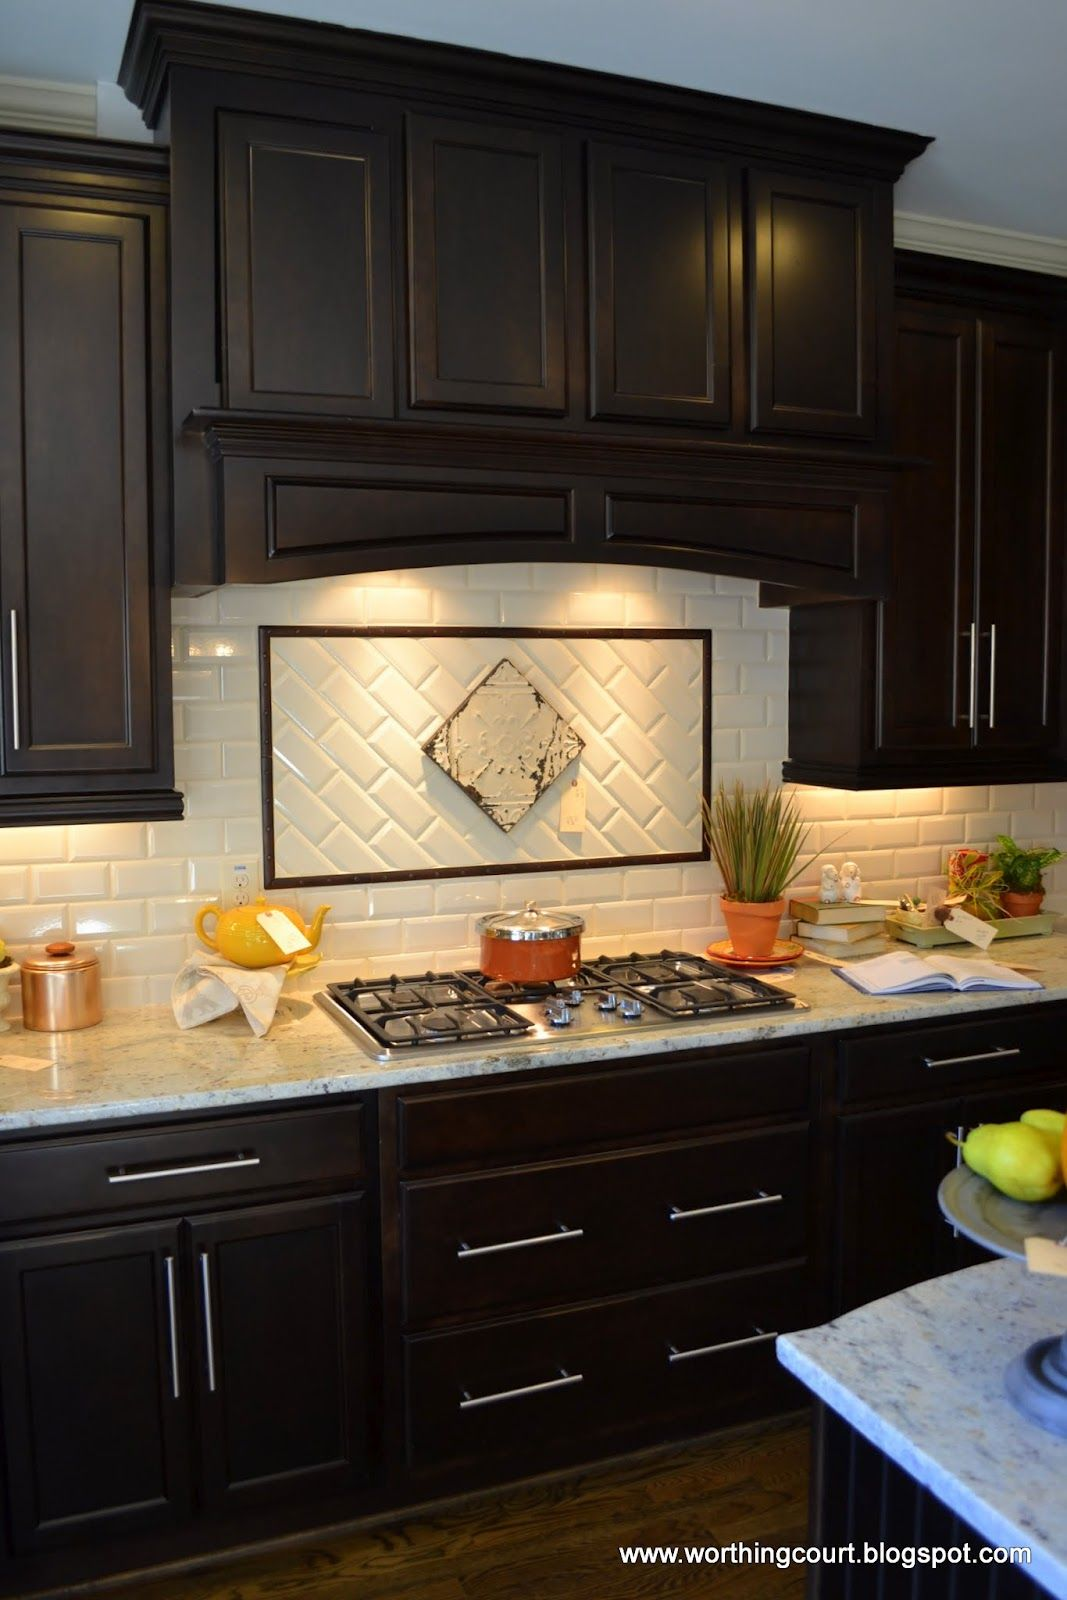 kitchen cabinets backsplash ideas photo - 5